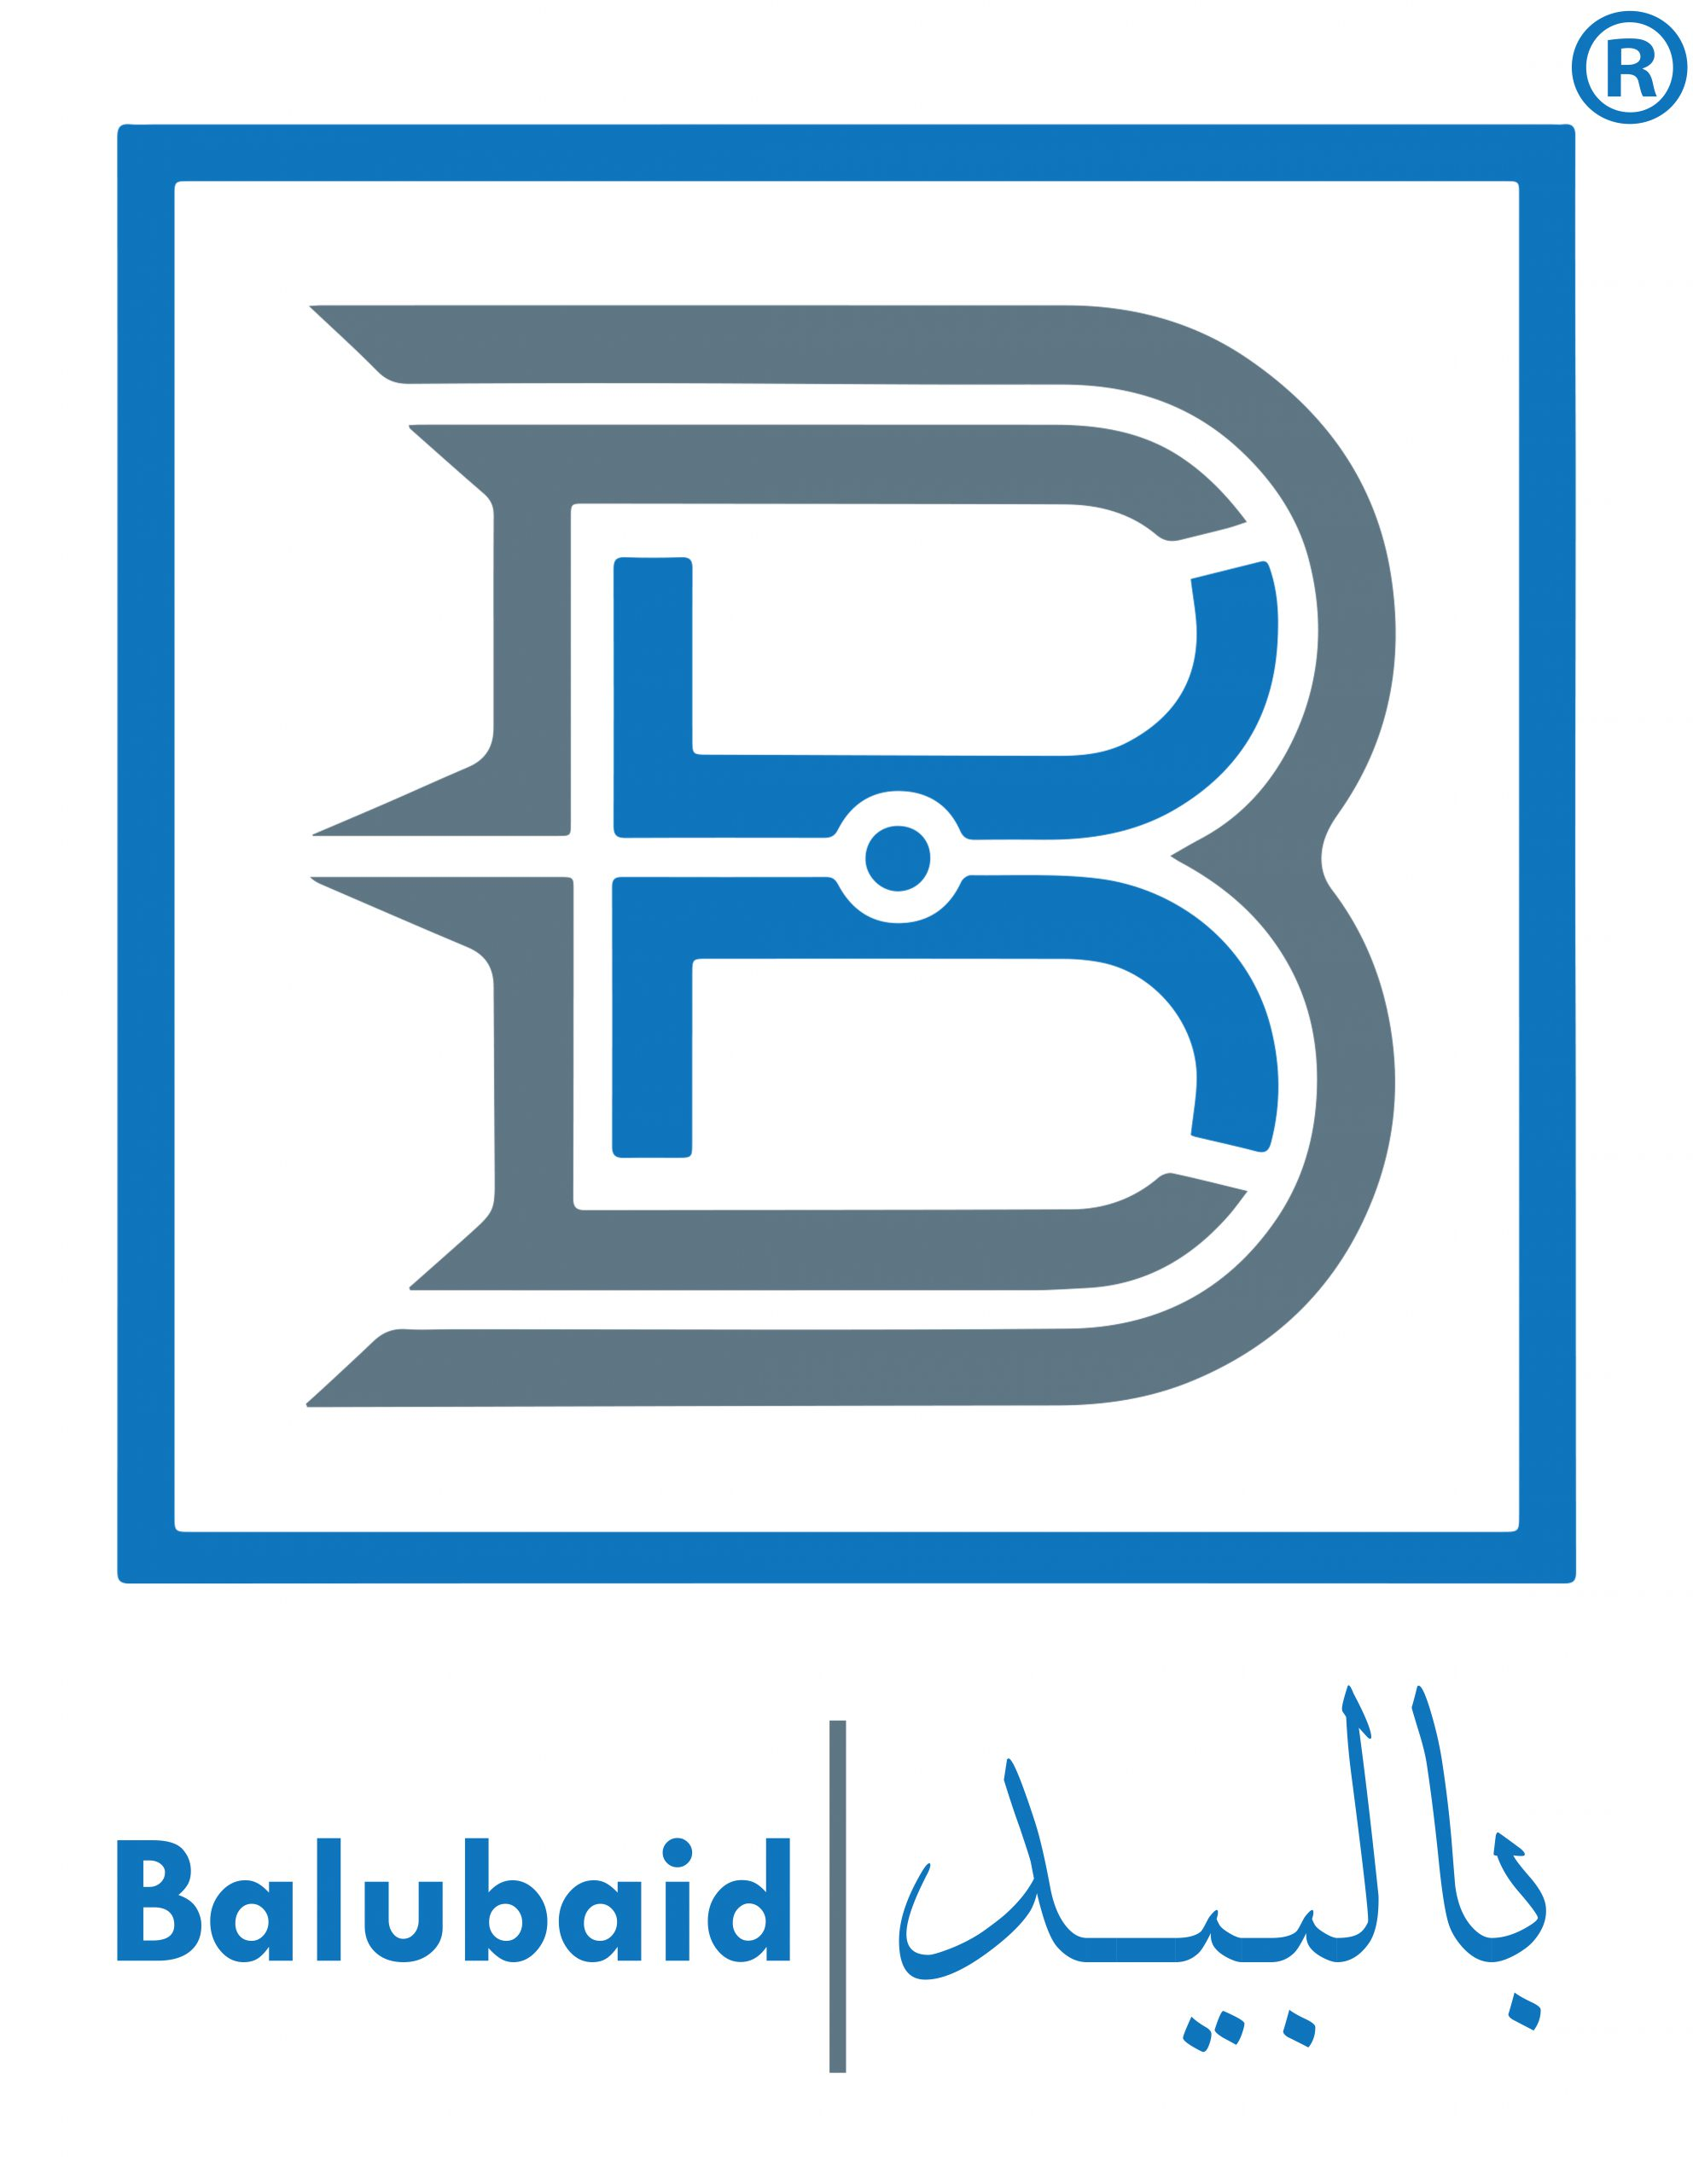 balubaid color logo